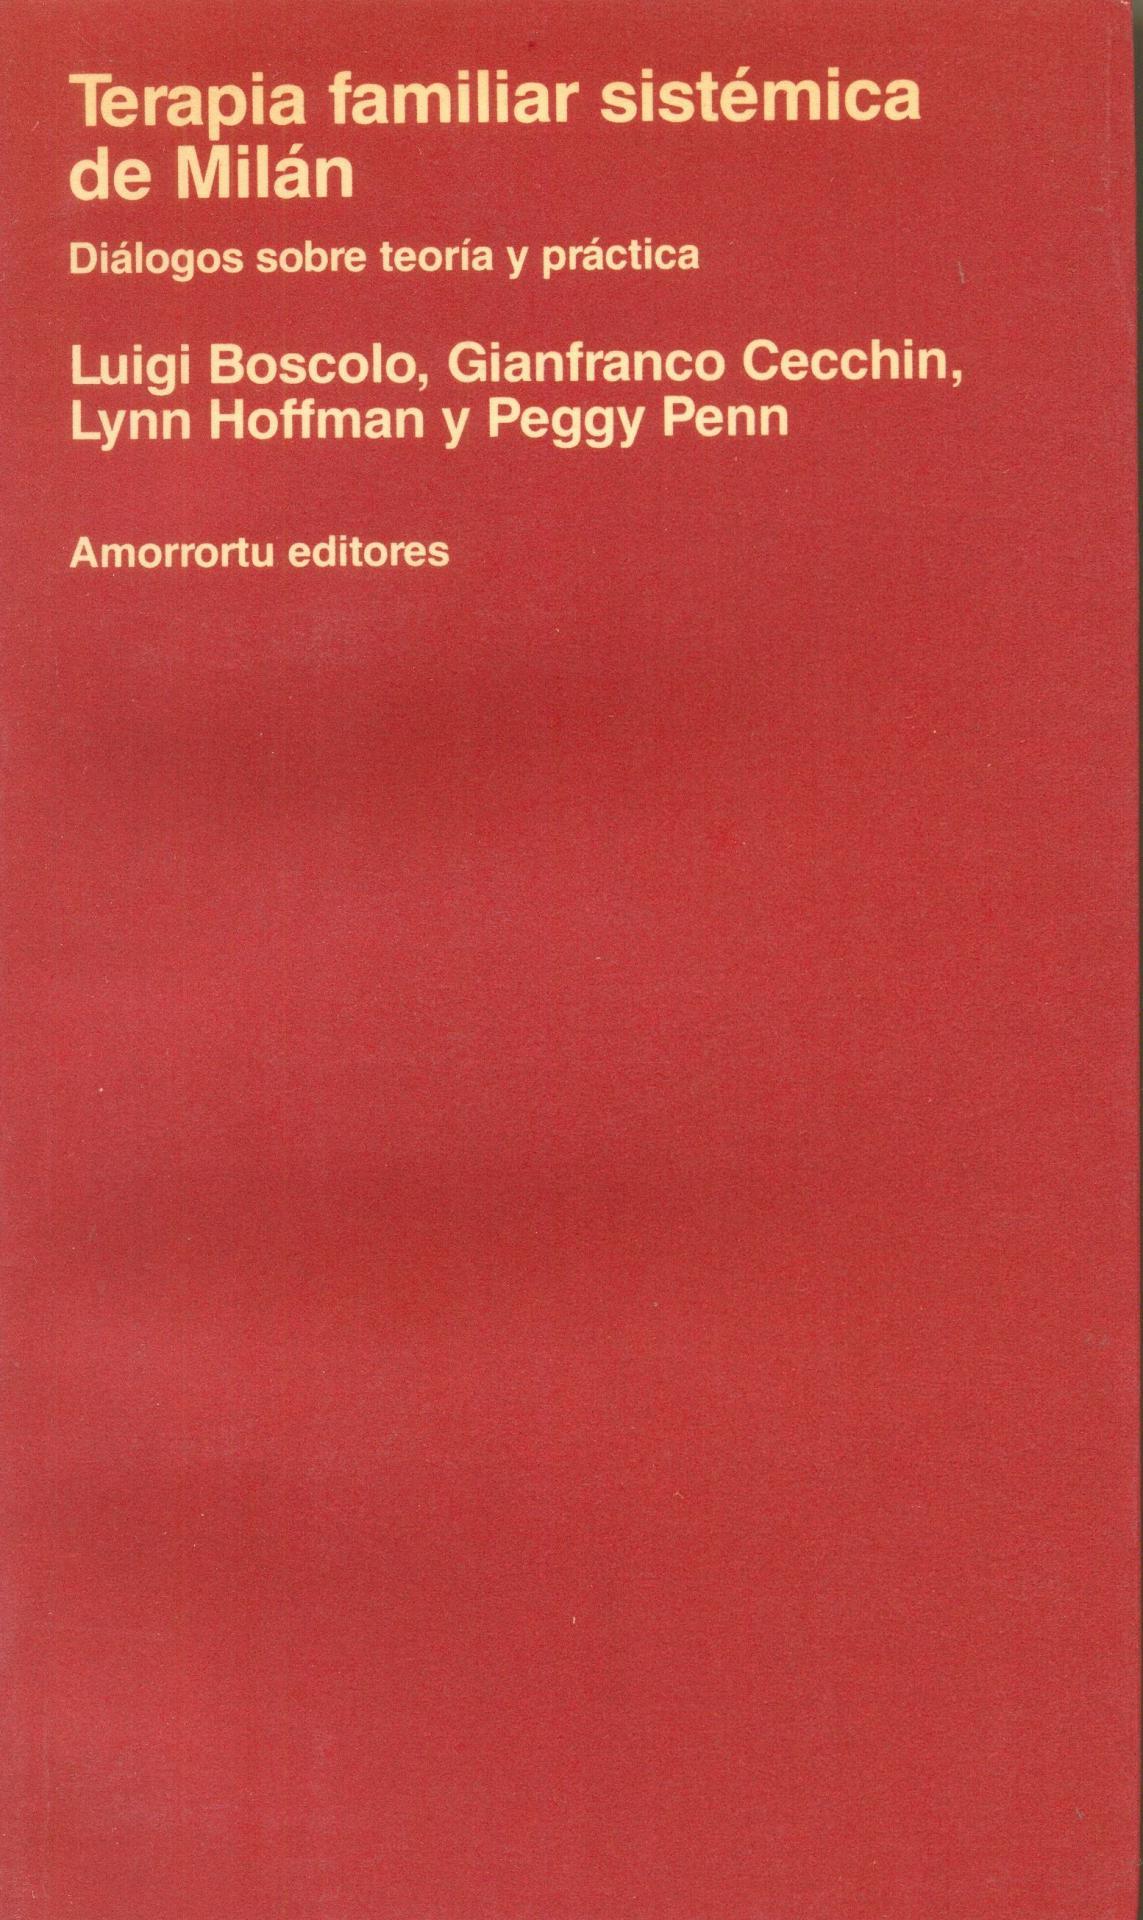 TERAPIA FAMILIAR SISTÉMICA DE MILÁN. Diálogos sobre teoría y práctica. Boscolo, L; Cecchin, G.; Hoffman, L.; Penn, P.